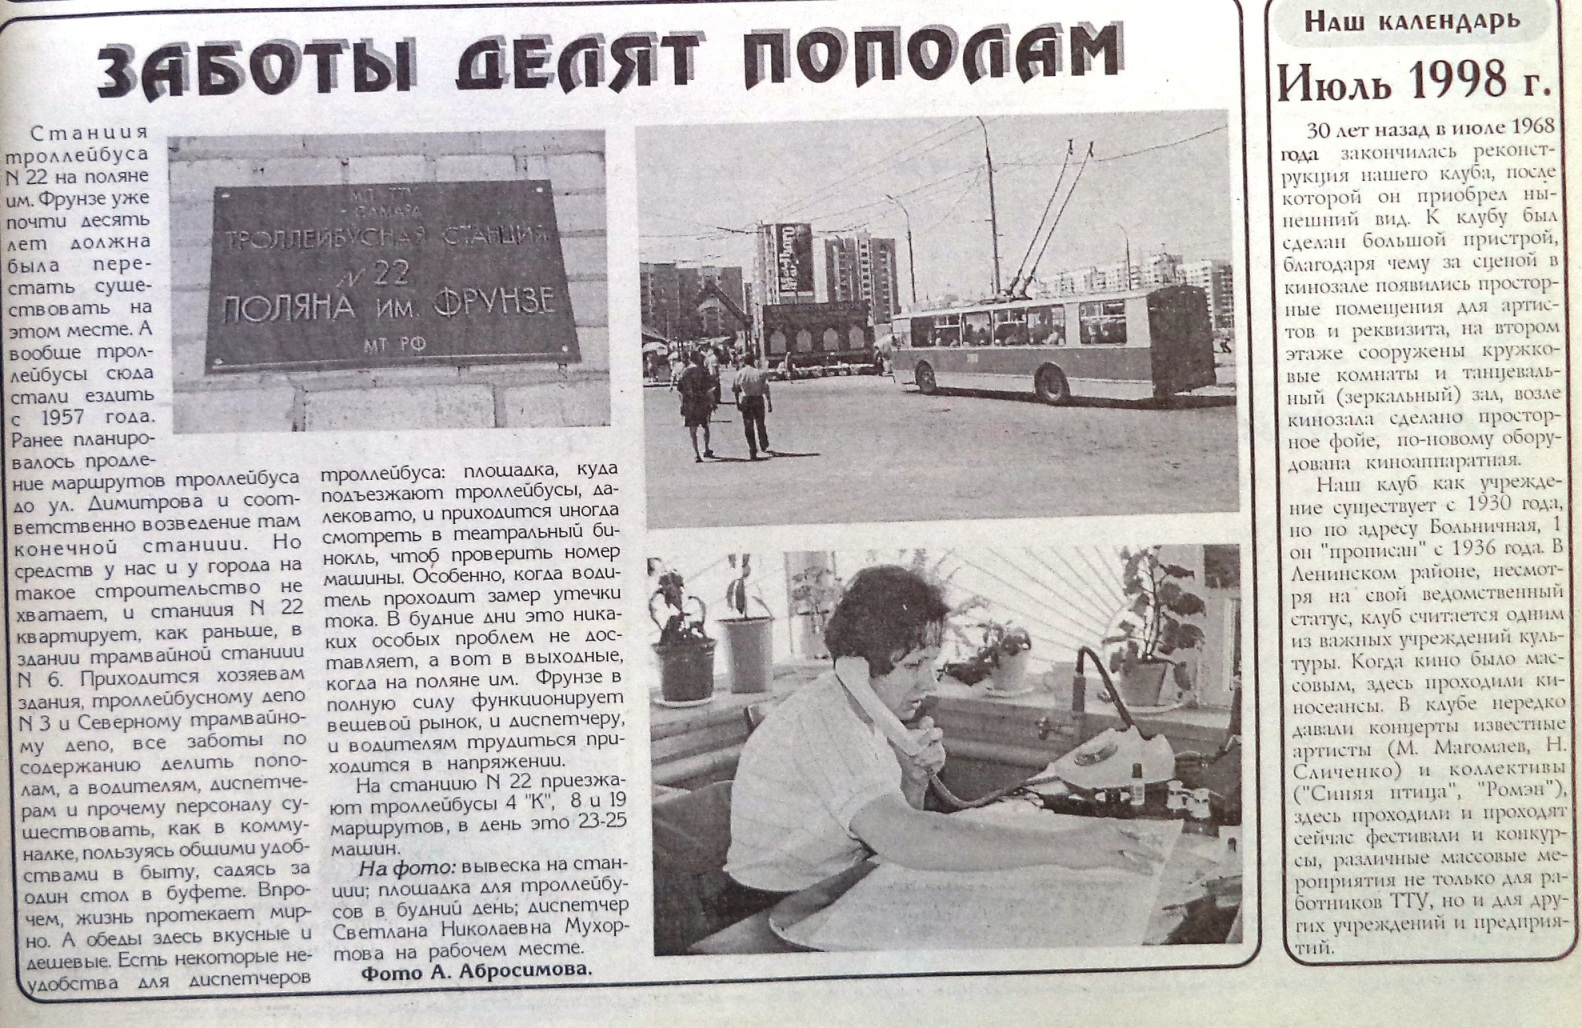 Ново-Садовая-ФОТО-128-ЗРР-1998-07-09-ТС № 22 на Поляне